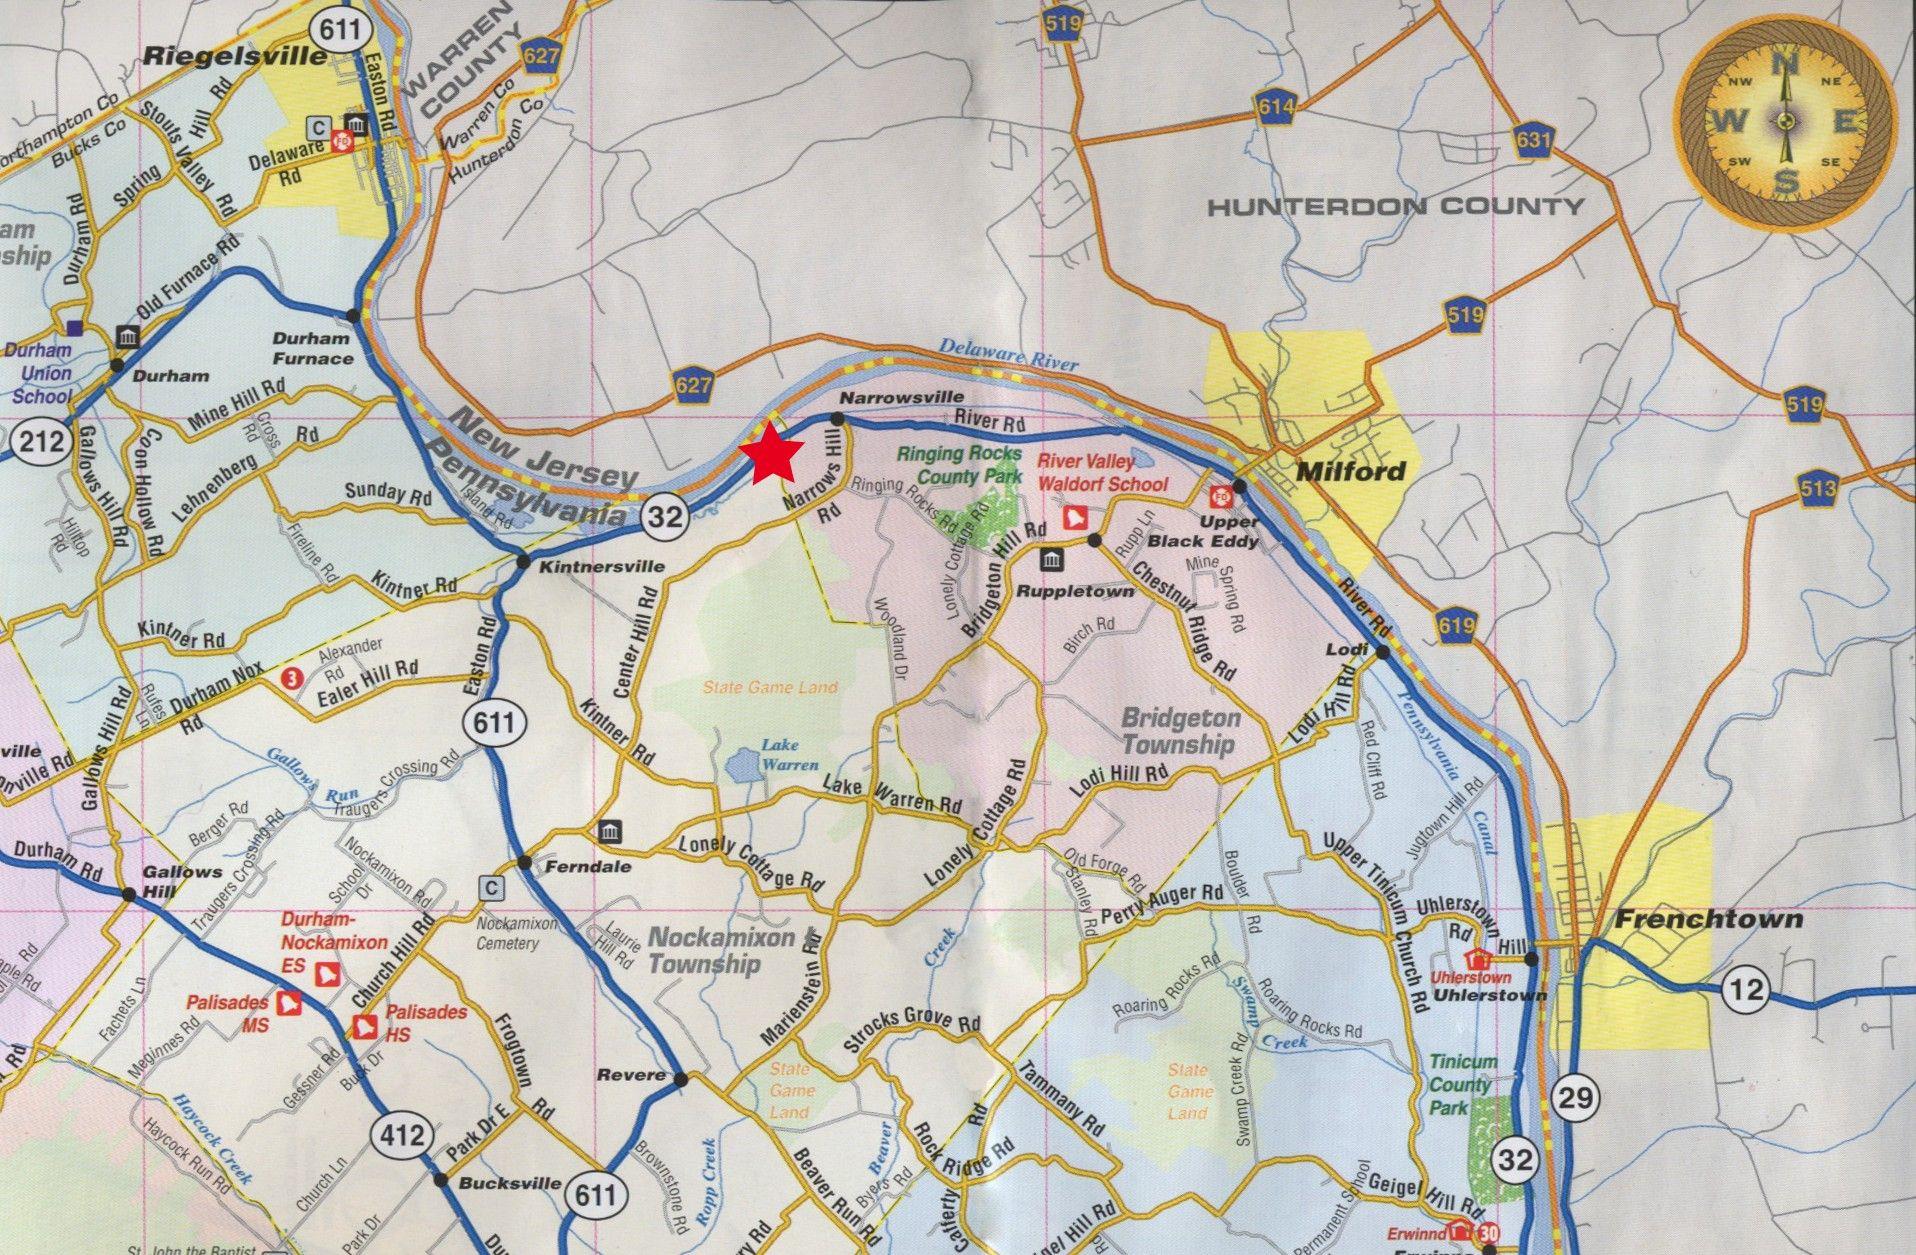 Bucks County Pa Road Map Upper Bucks County